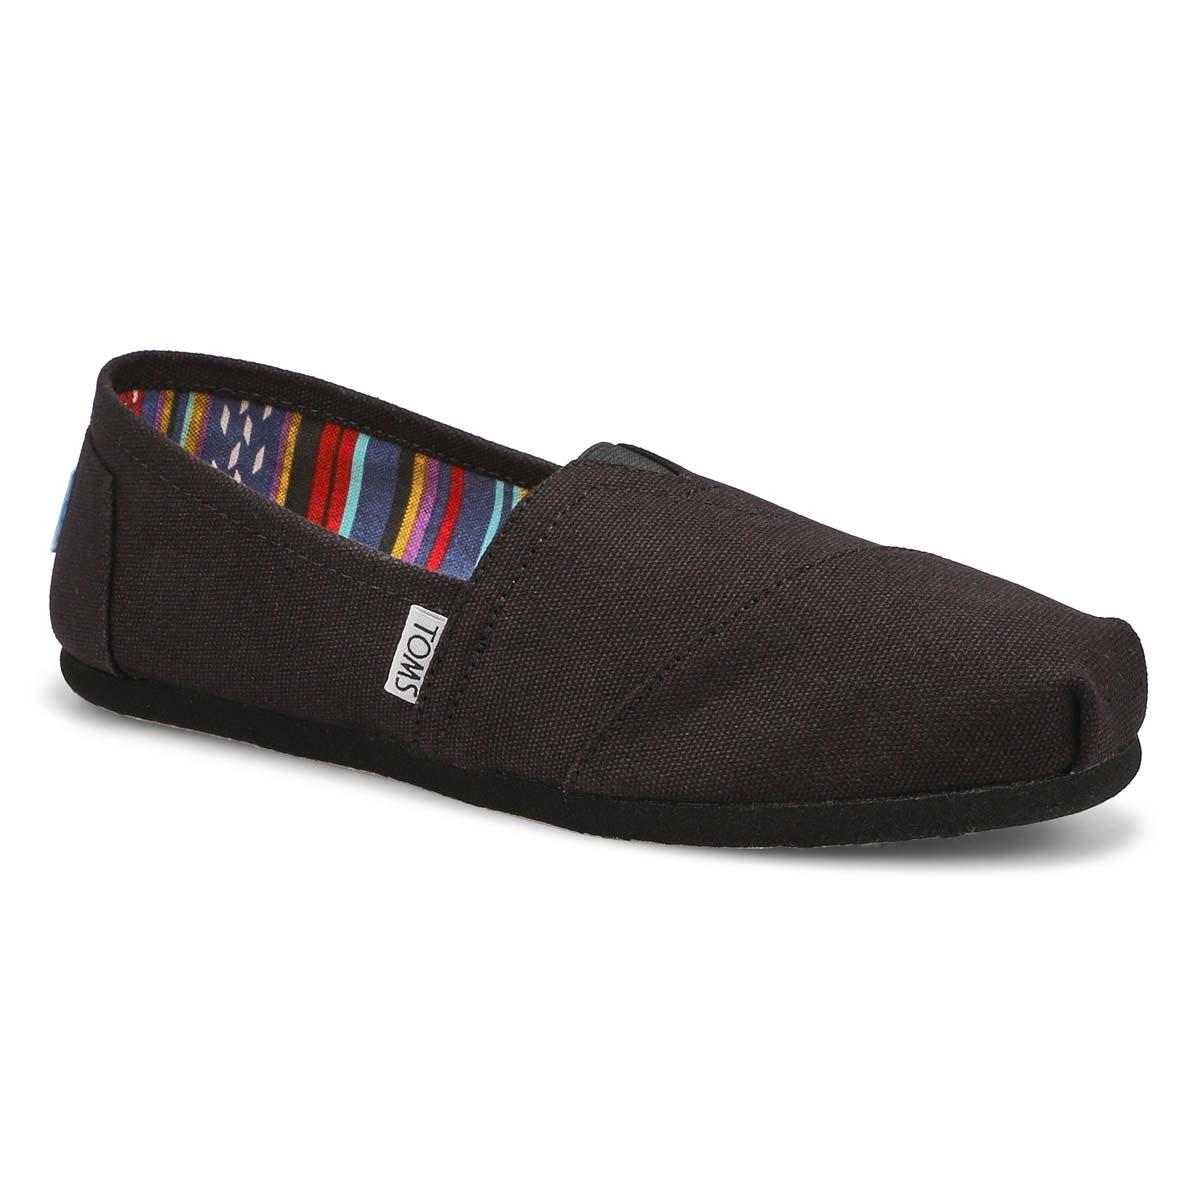 Women's CLASSIC black/black canvas loafers